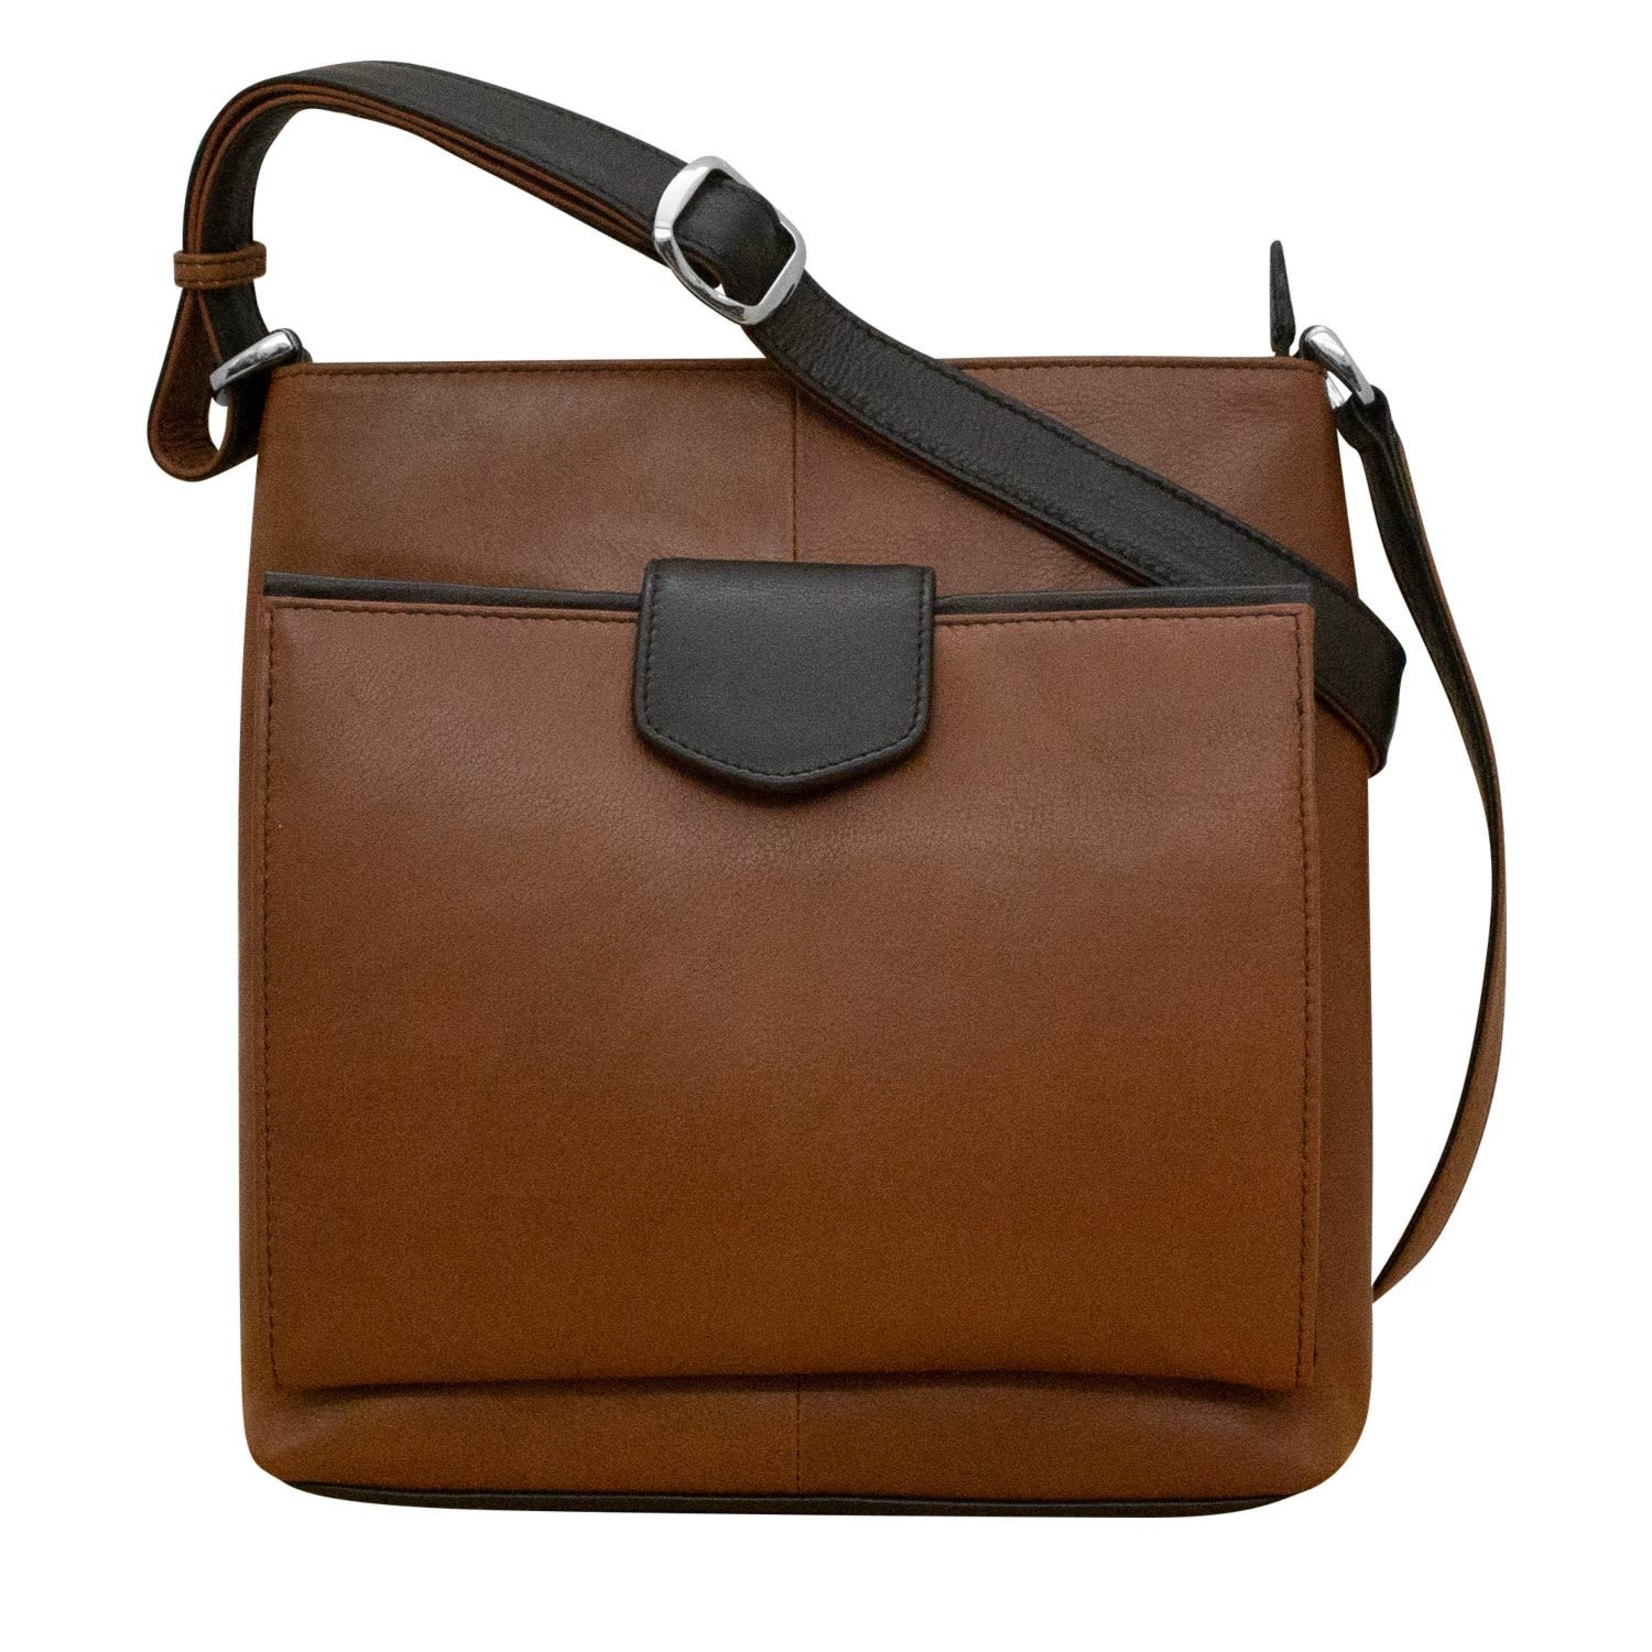 Leather Handbags and Accessories 6593 Toffee/Black - Organizer Crossbody